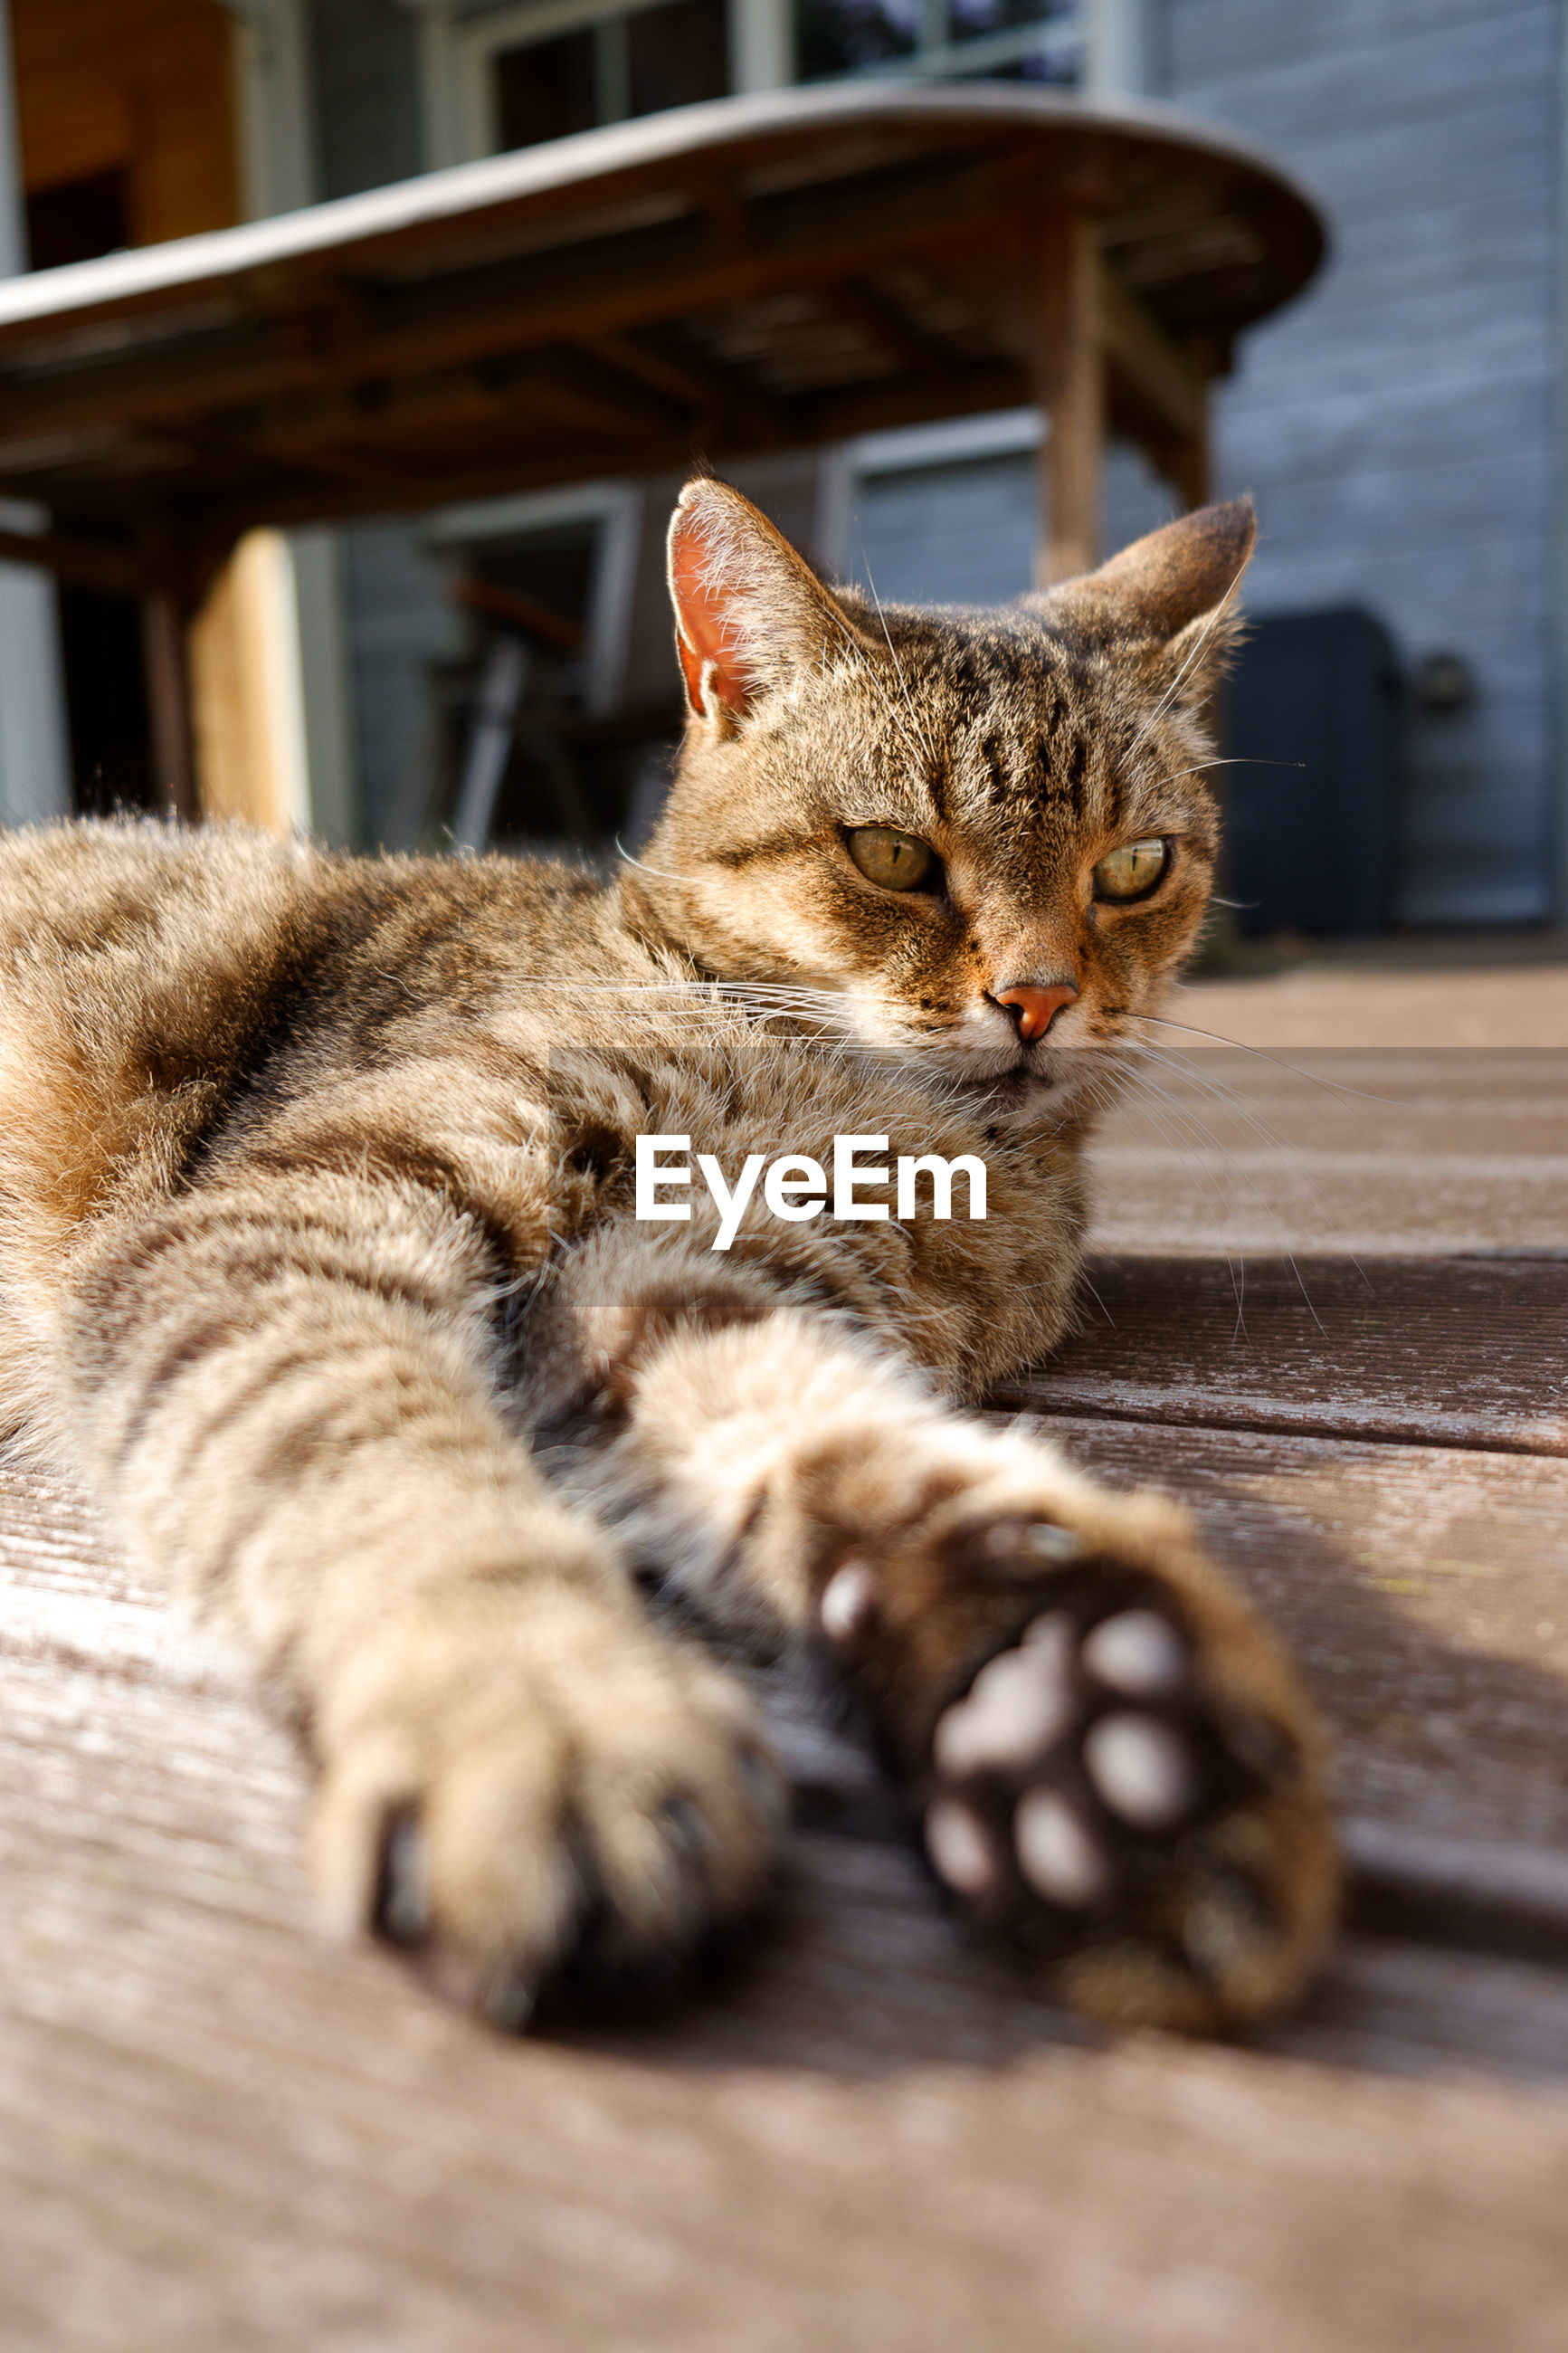 CAT LYING ON A FLOOR